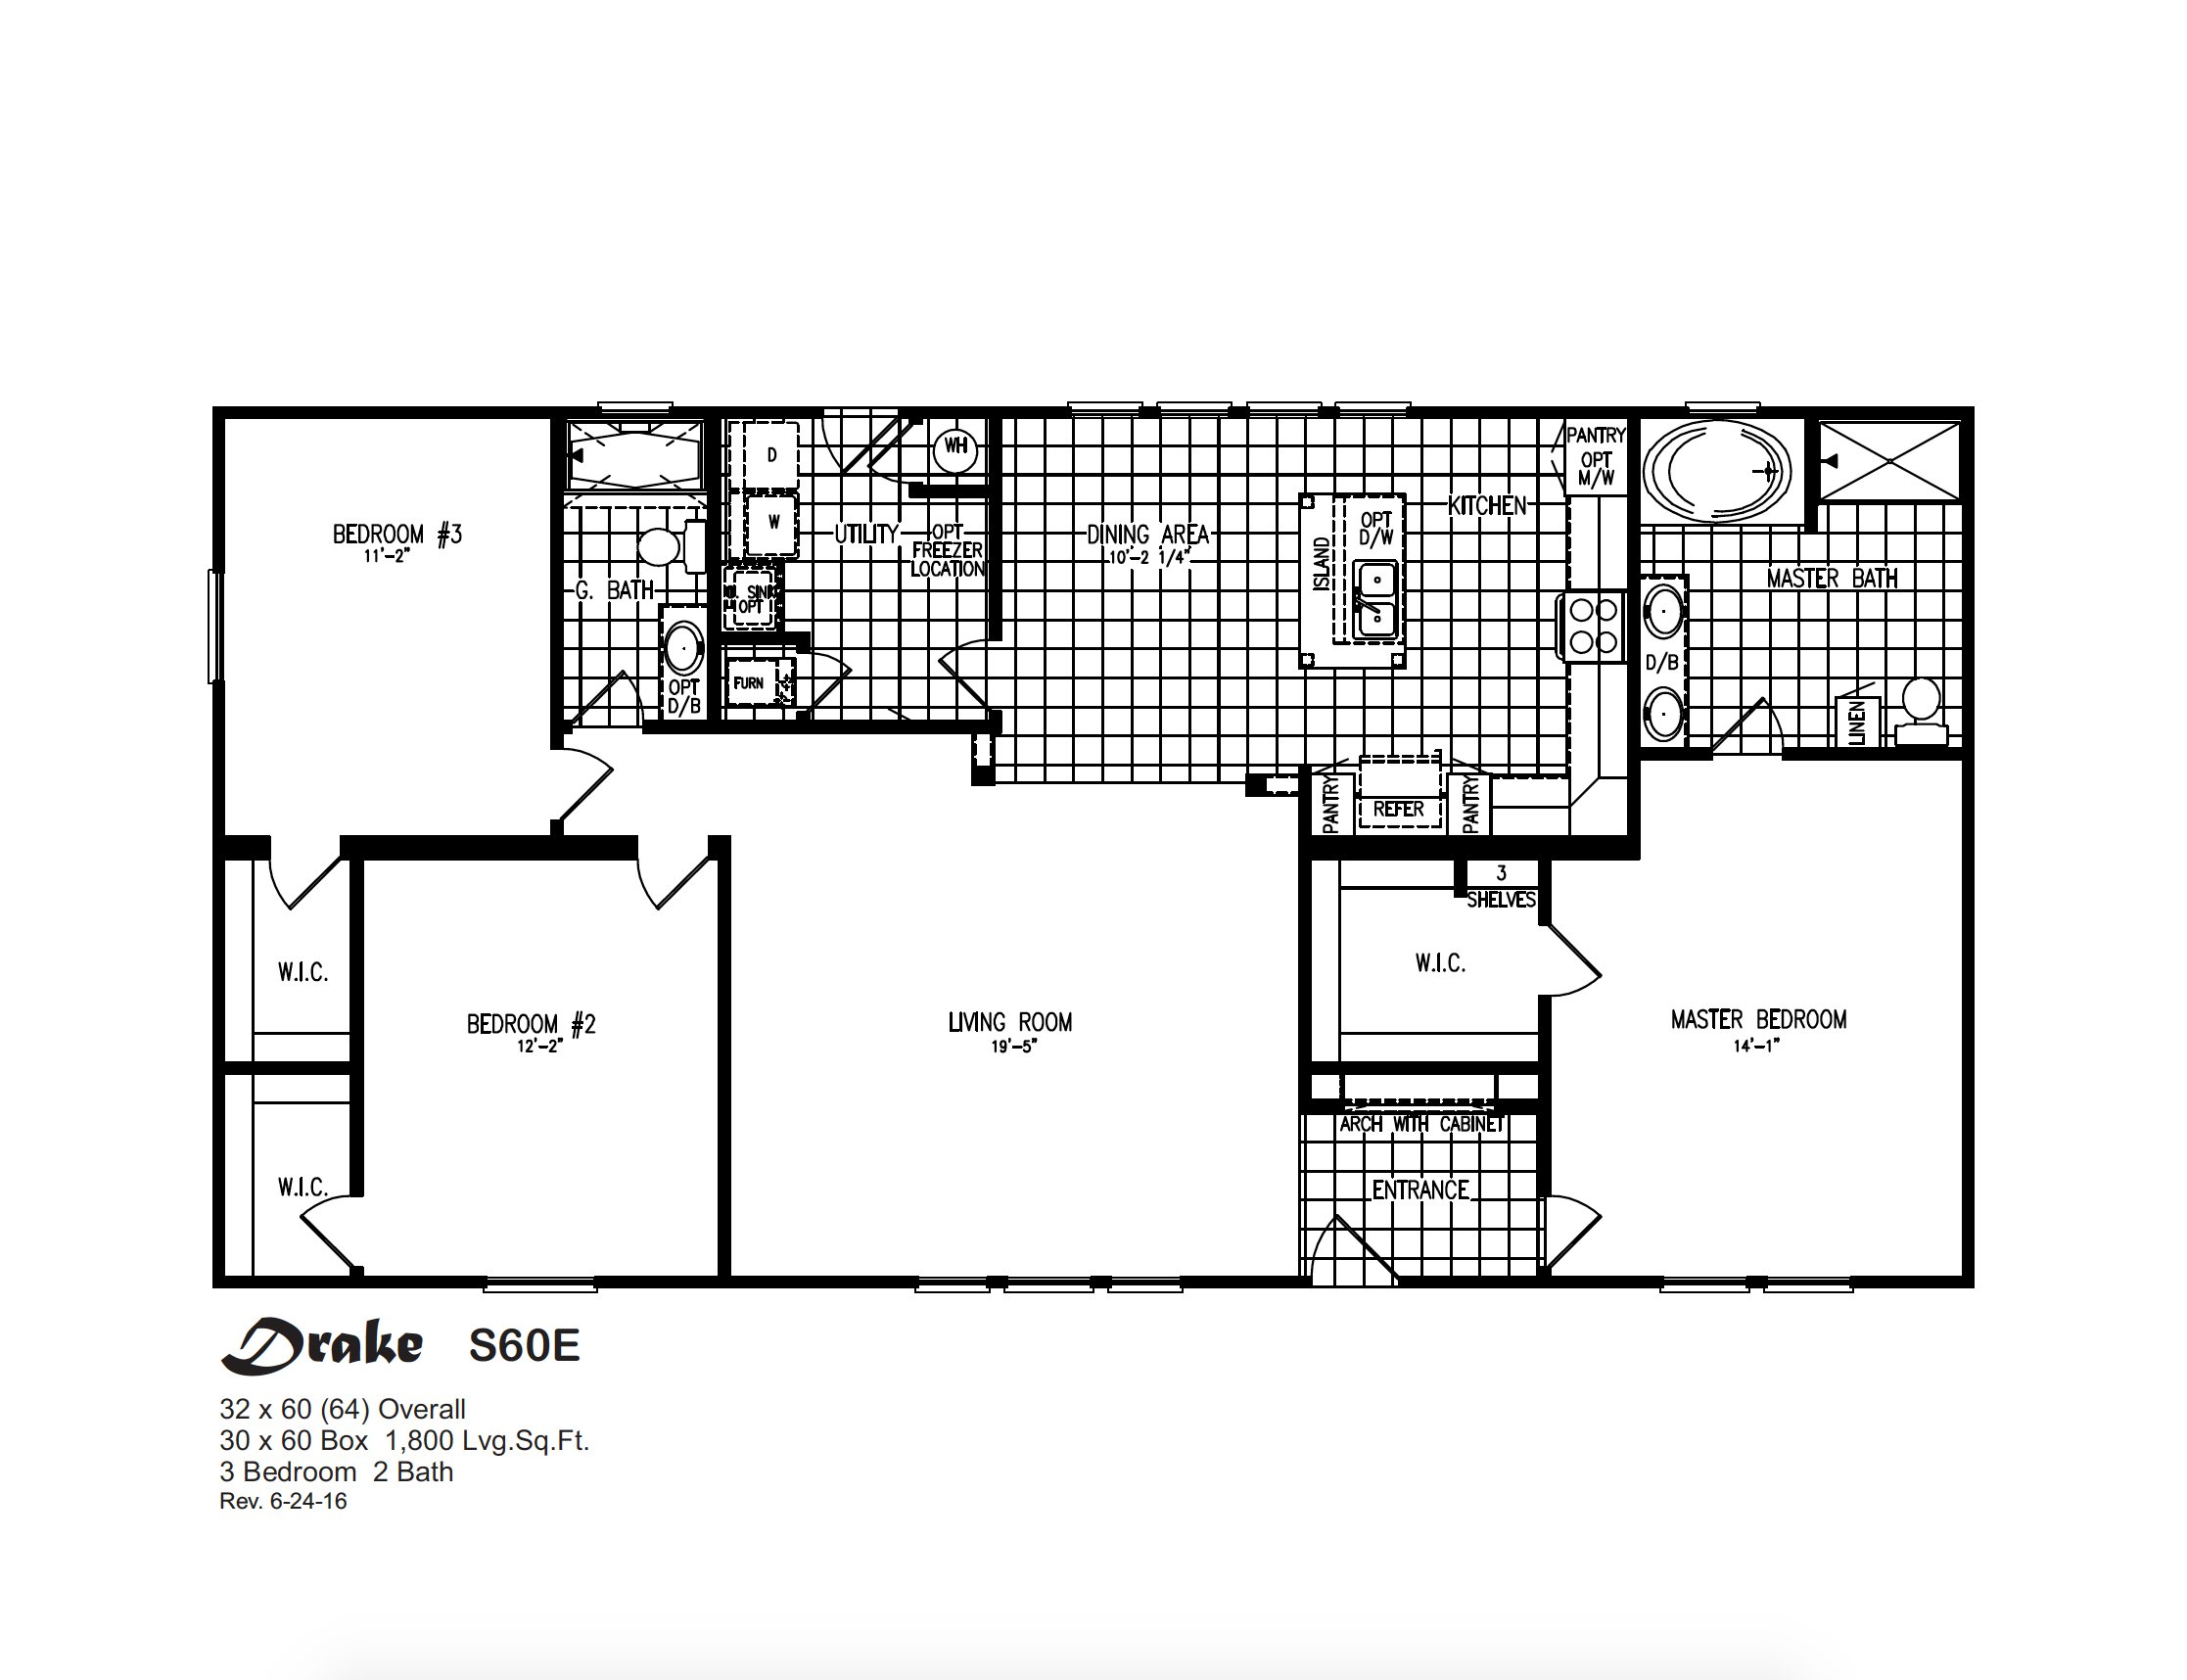 Prime Series - Drake S60E